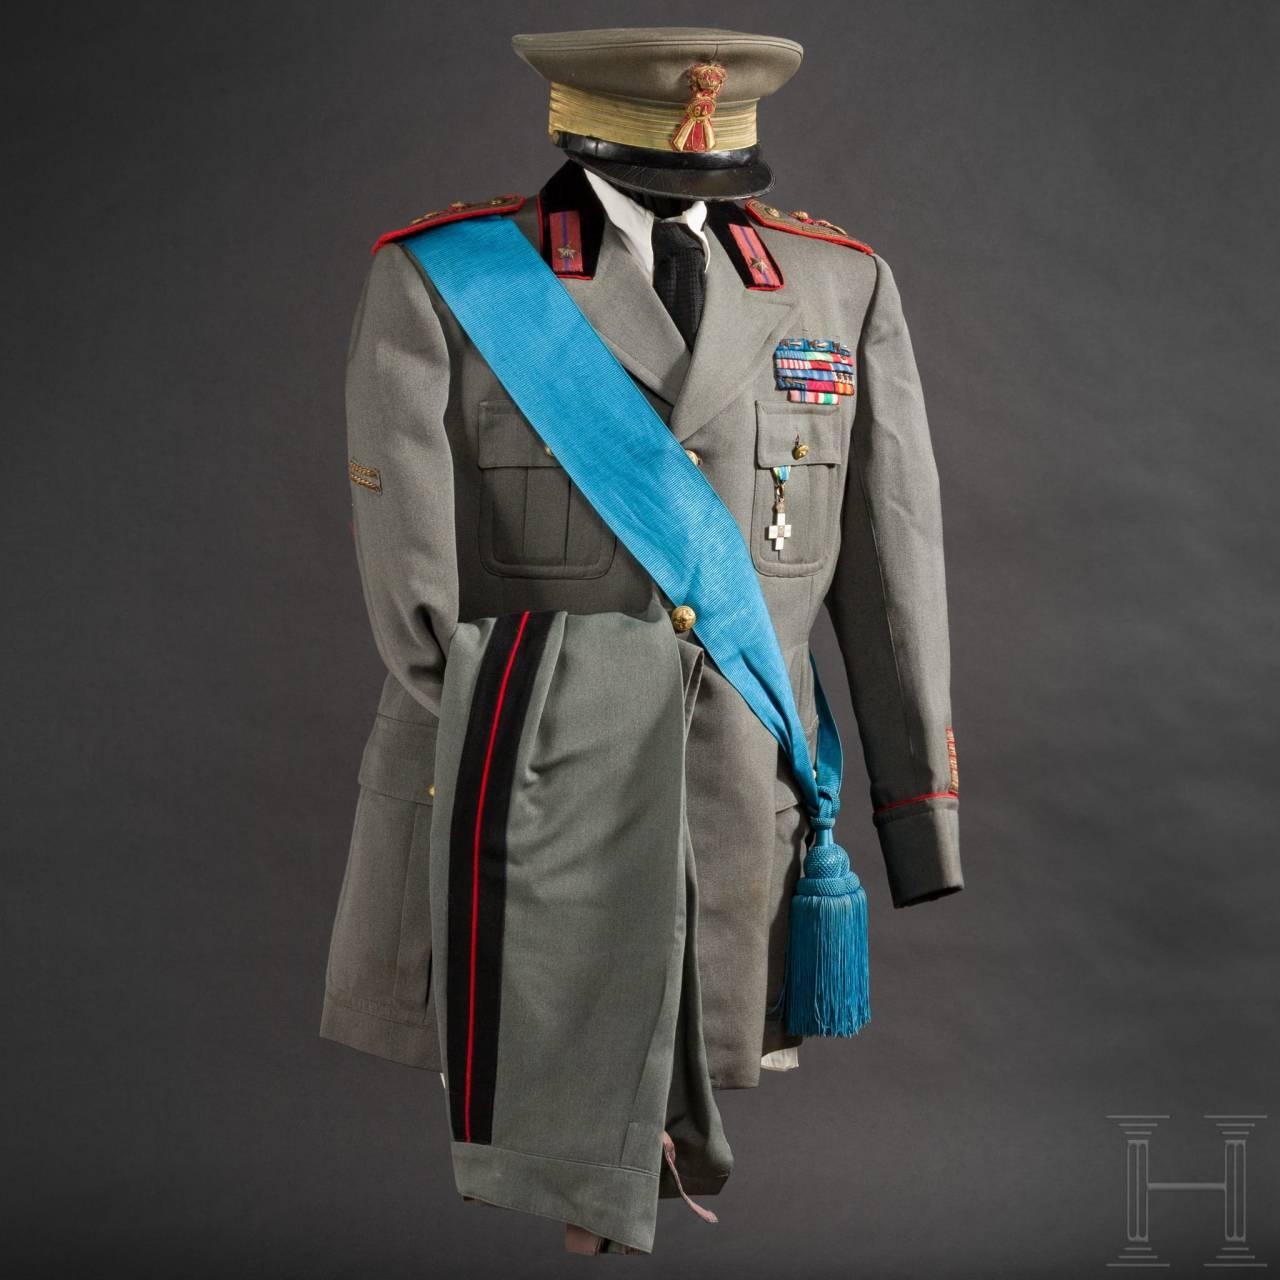 "Uniform M 34 für Oberst Zacco, Kommandeur des 84. Infanterie-Regiments ""Venezia"", 2. Weltkrieg"